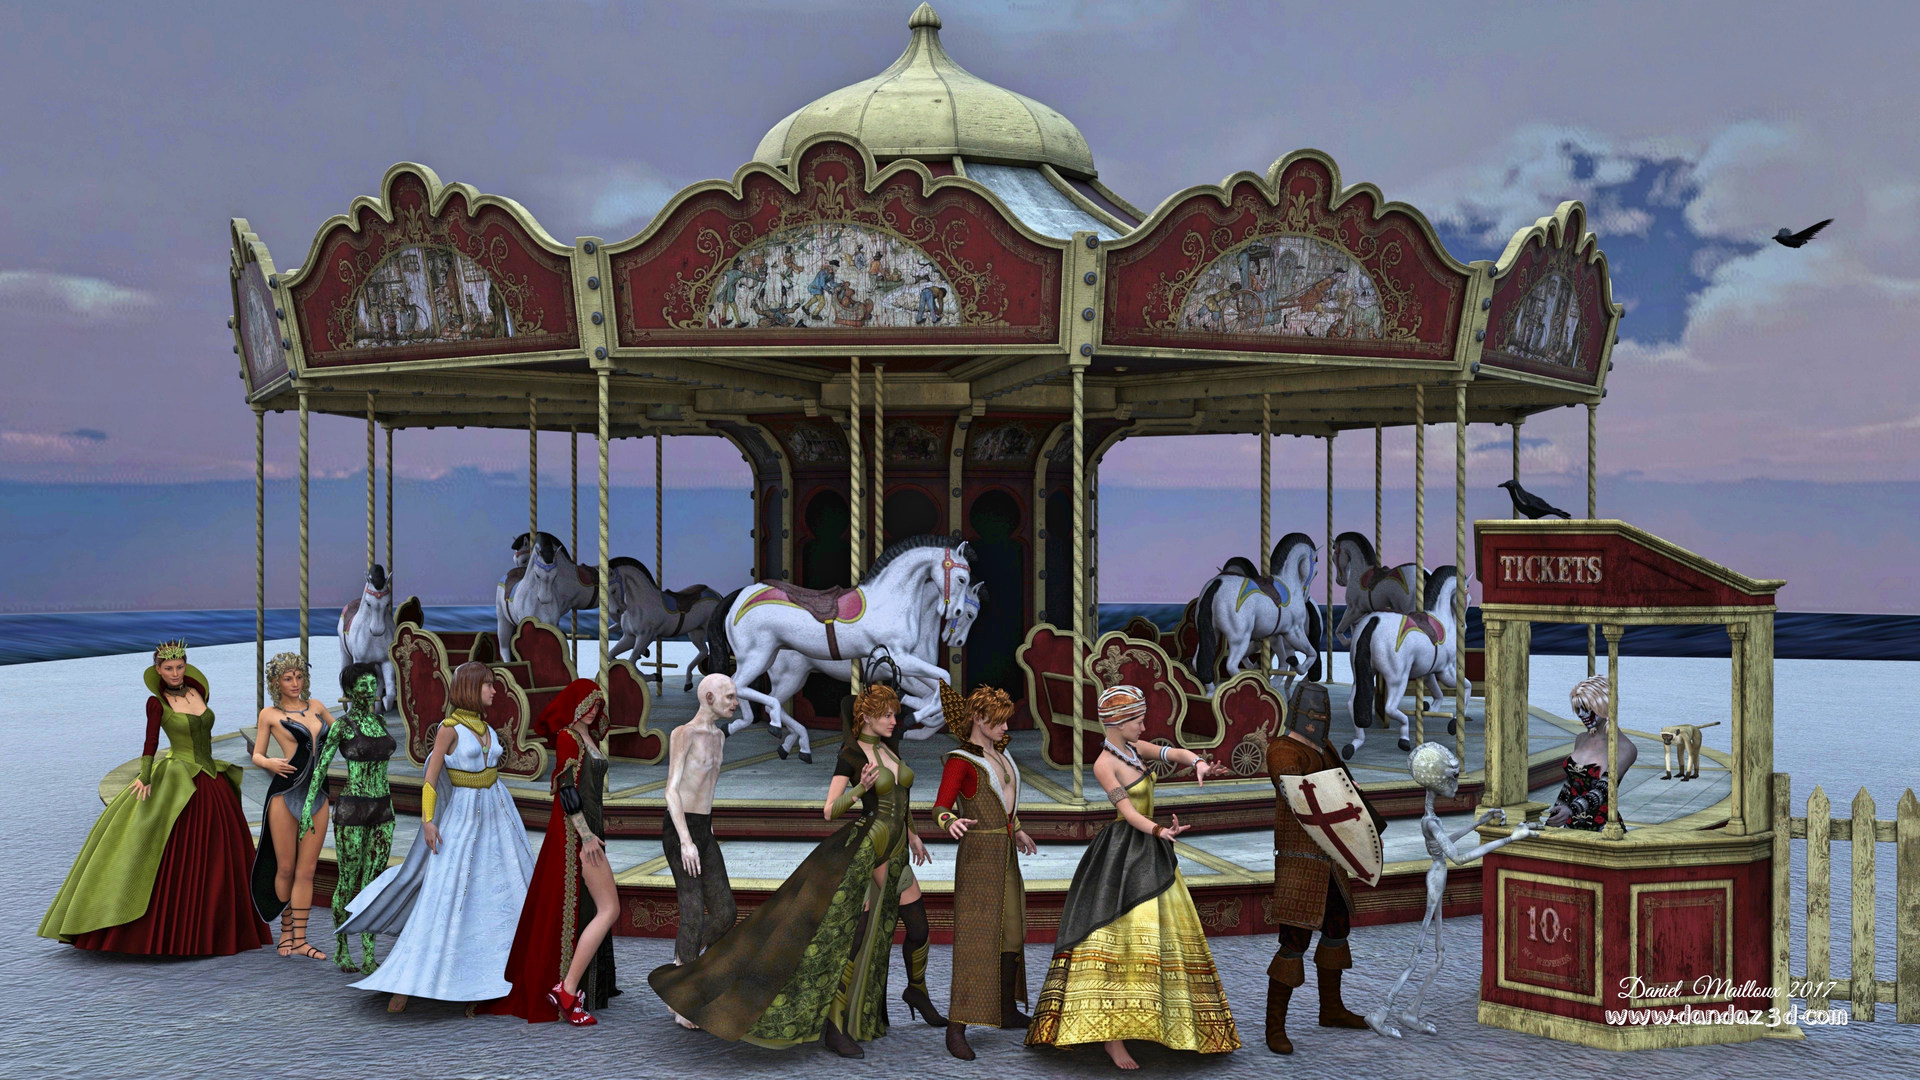 Carousel waitline